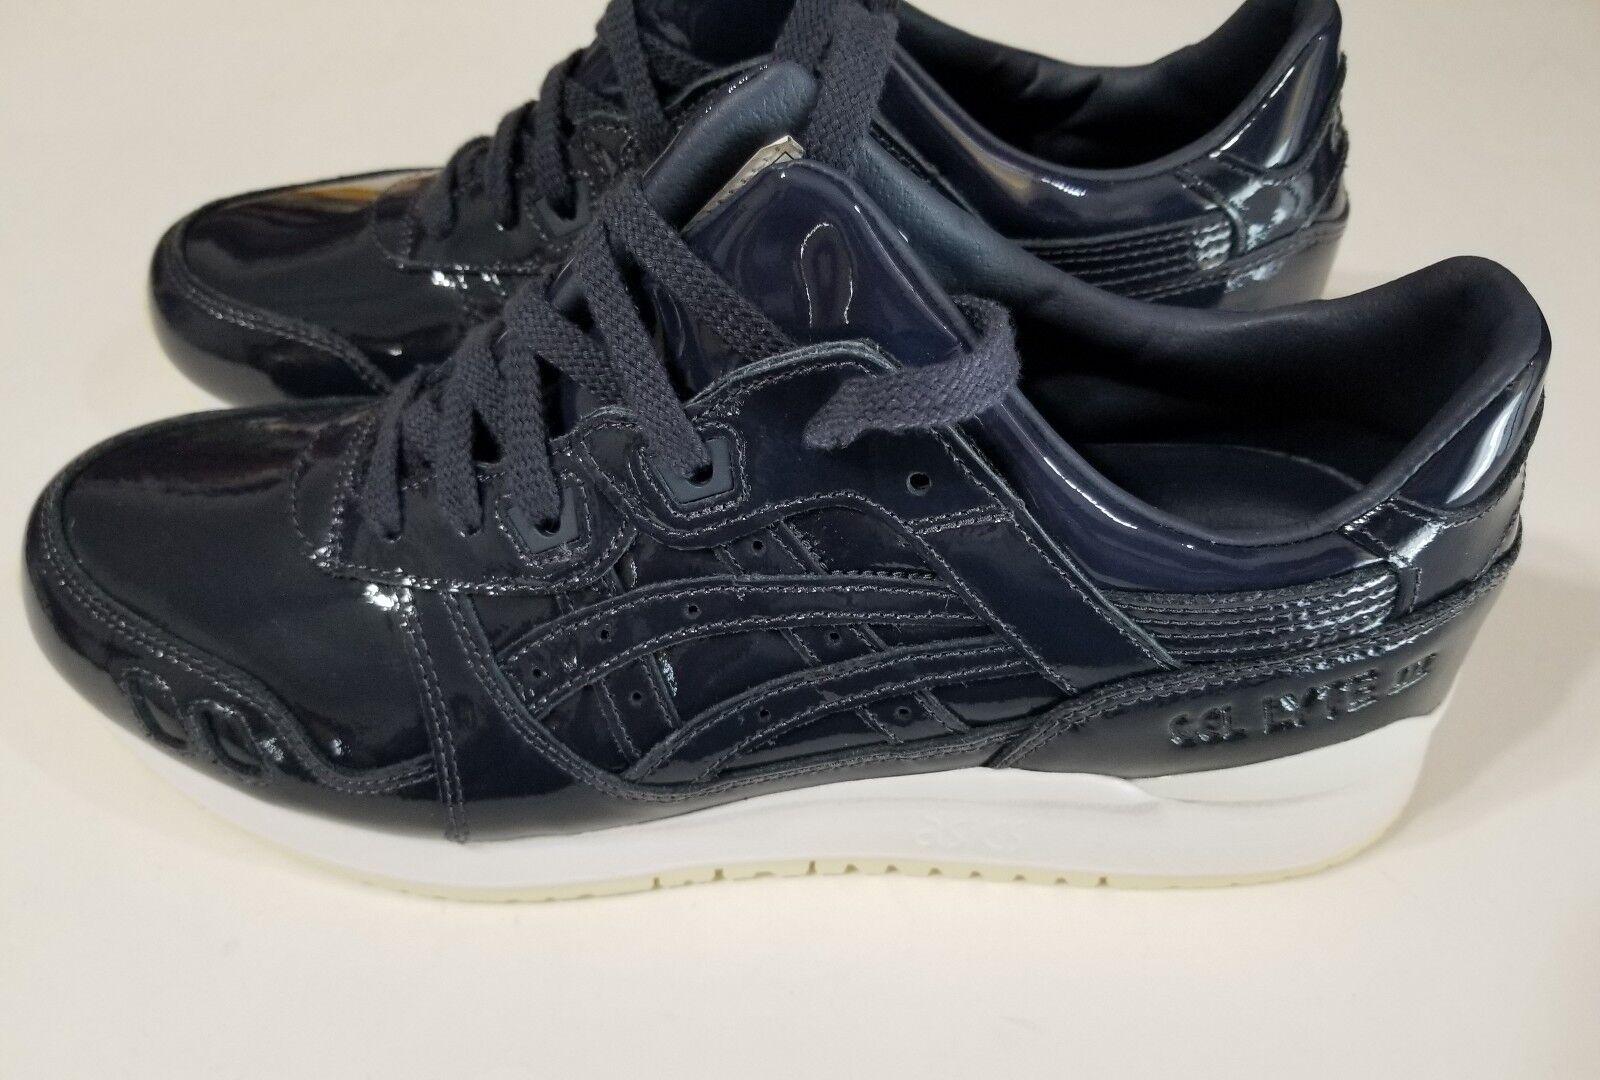 Asics Gel Tiger Gel Lyte III Men's bluee Running Athletic shoes Sneakers Size 9.5